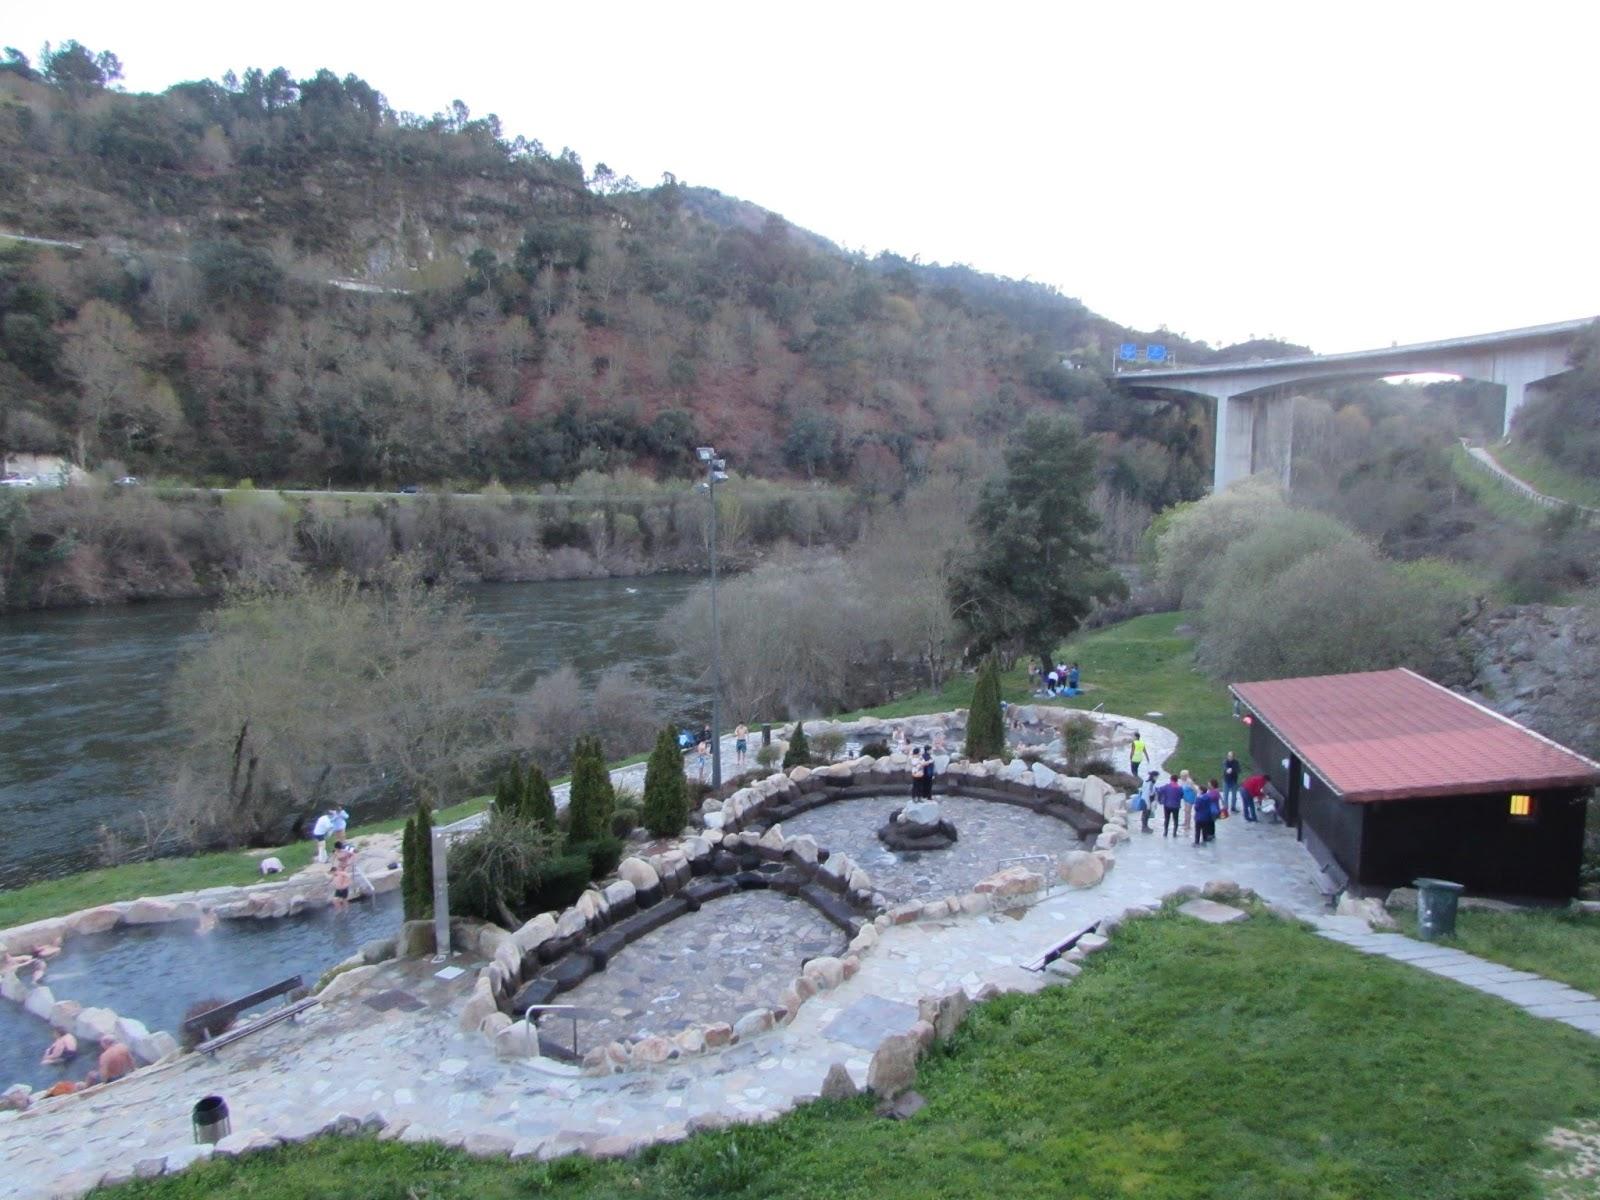 Las 5 piscinas naturales para perderse en galicia vigopeques for Piscinas en ourense